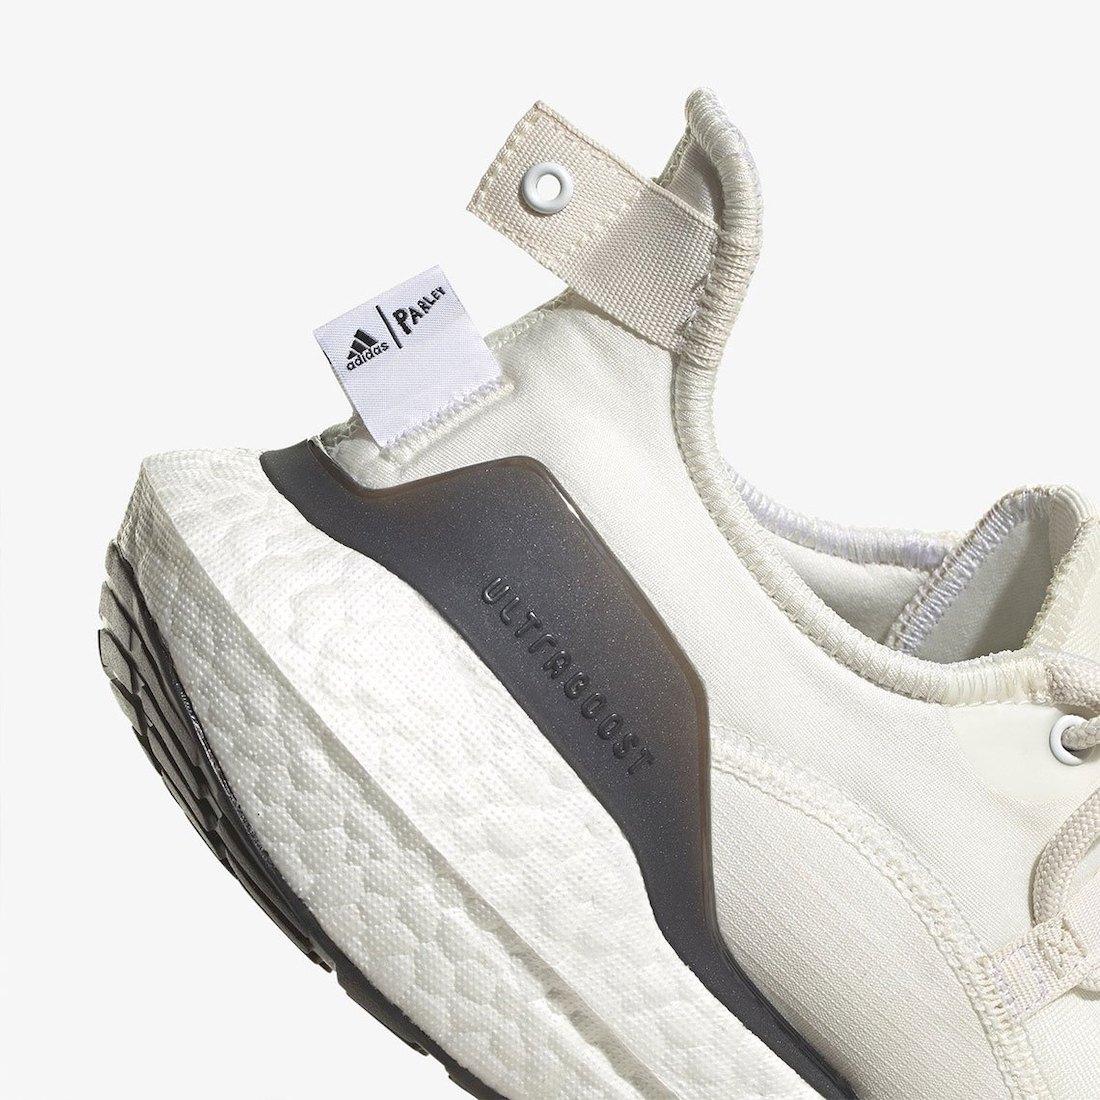 Parley,adidas,Ultra Boost 2021  海洋联名又来了!这双 Parley x Ultra Boost 2021 设计很特别!